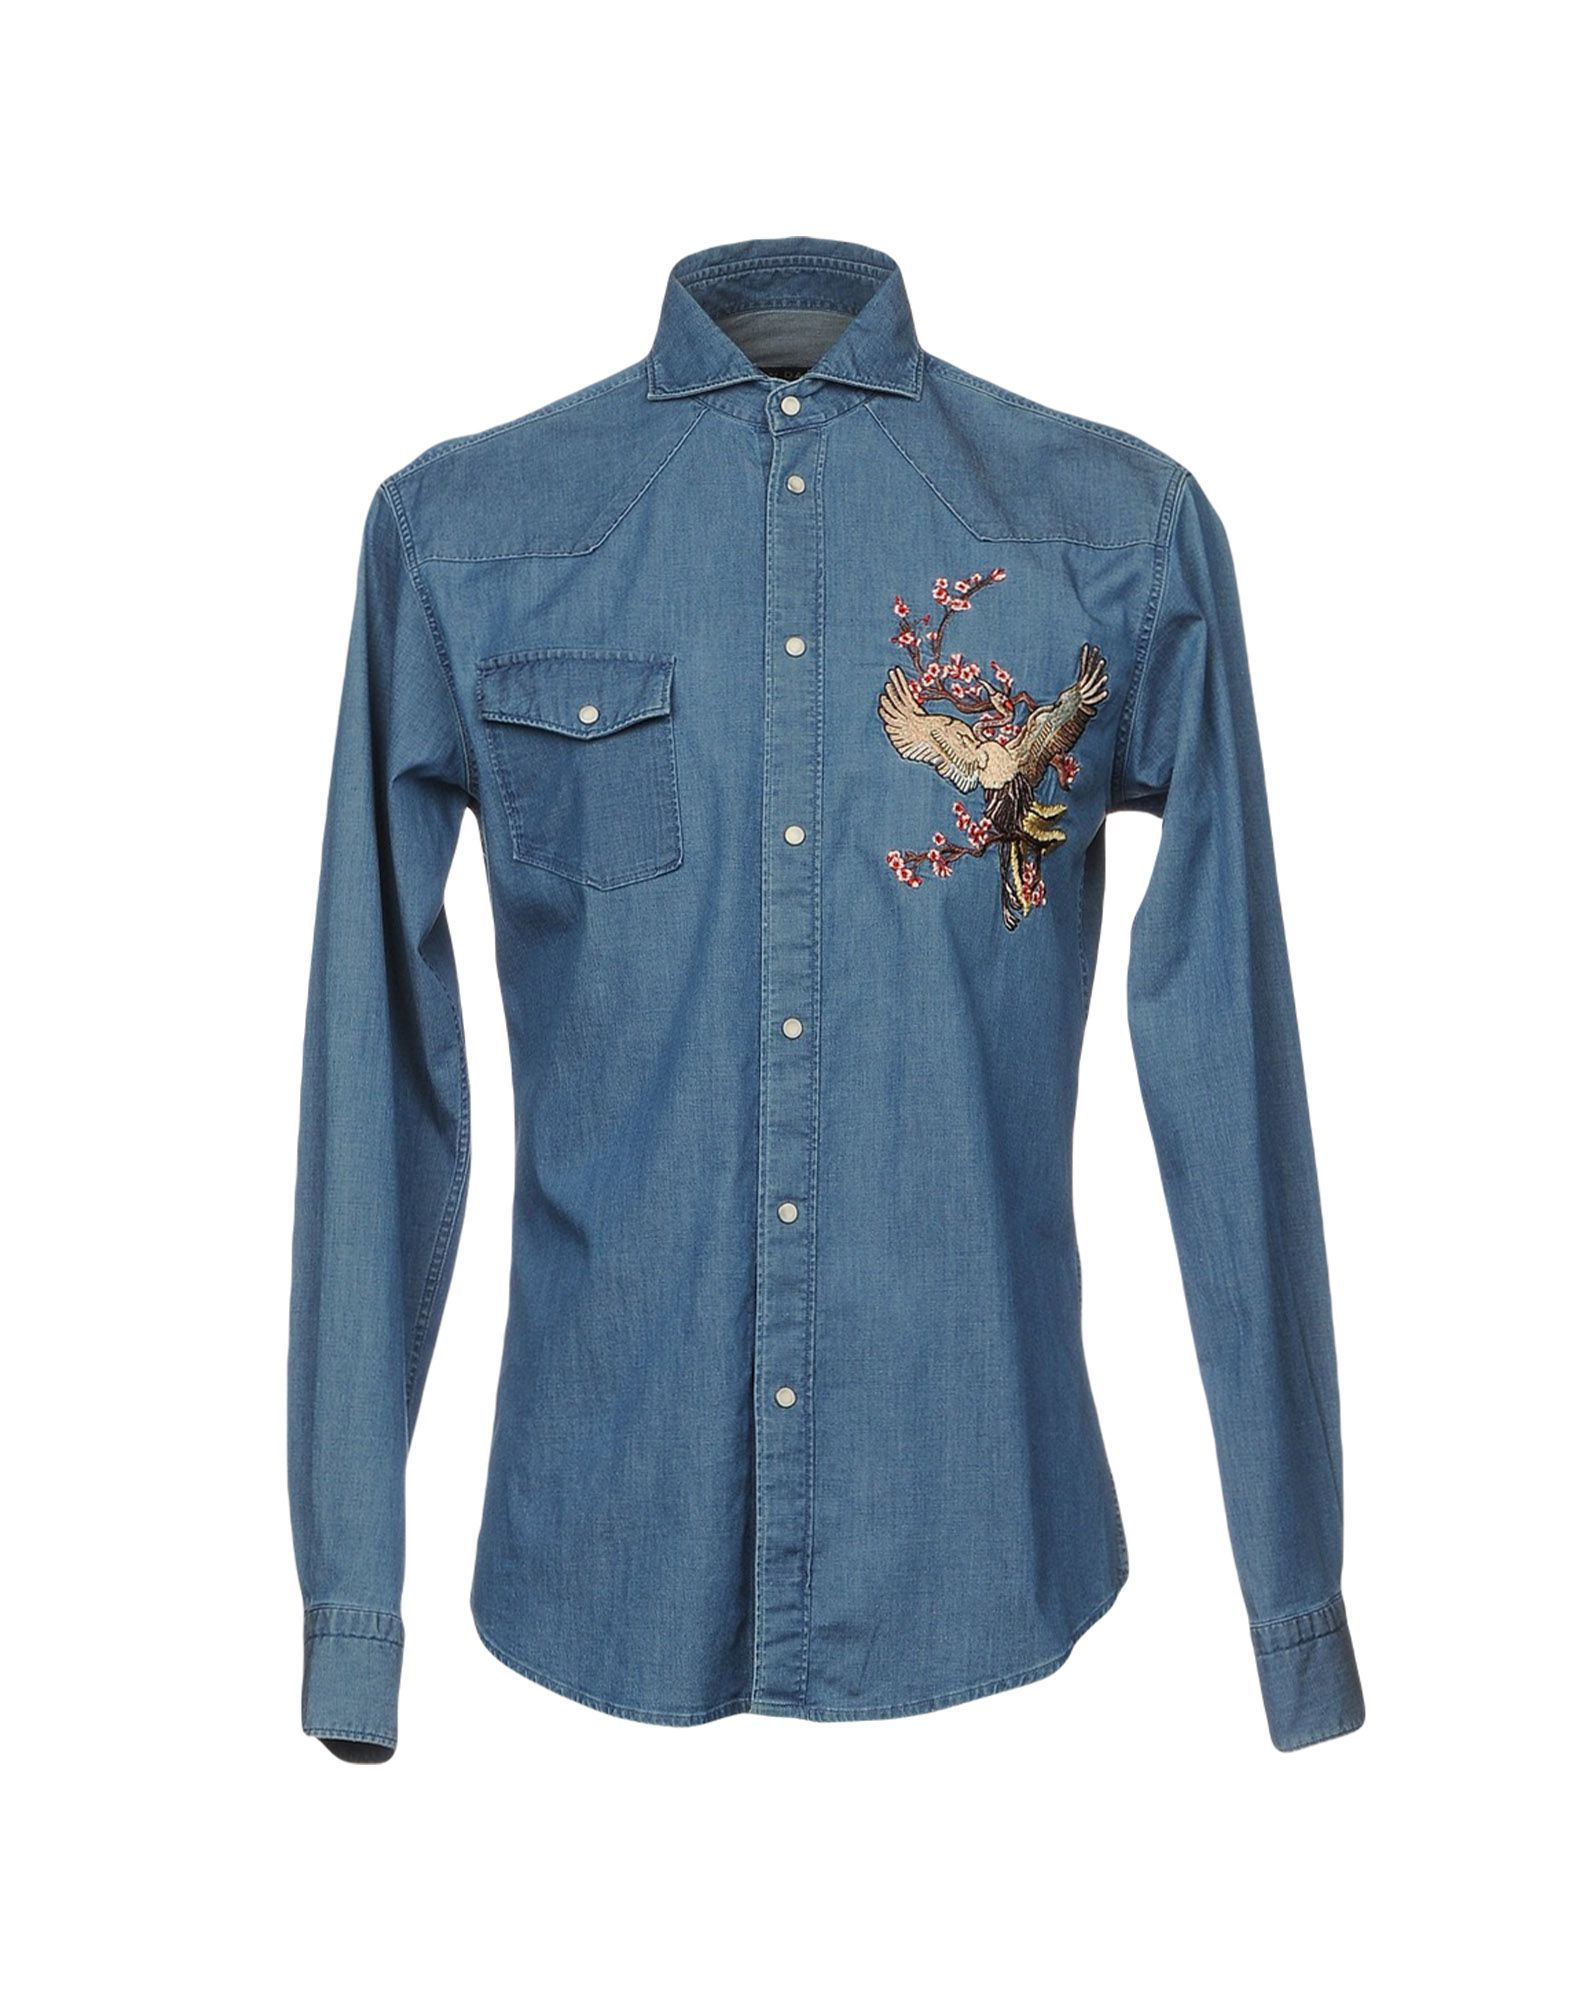 BRIAN DALES Джинсовая рубашка mcr джинсовая рубашка